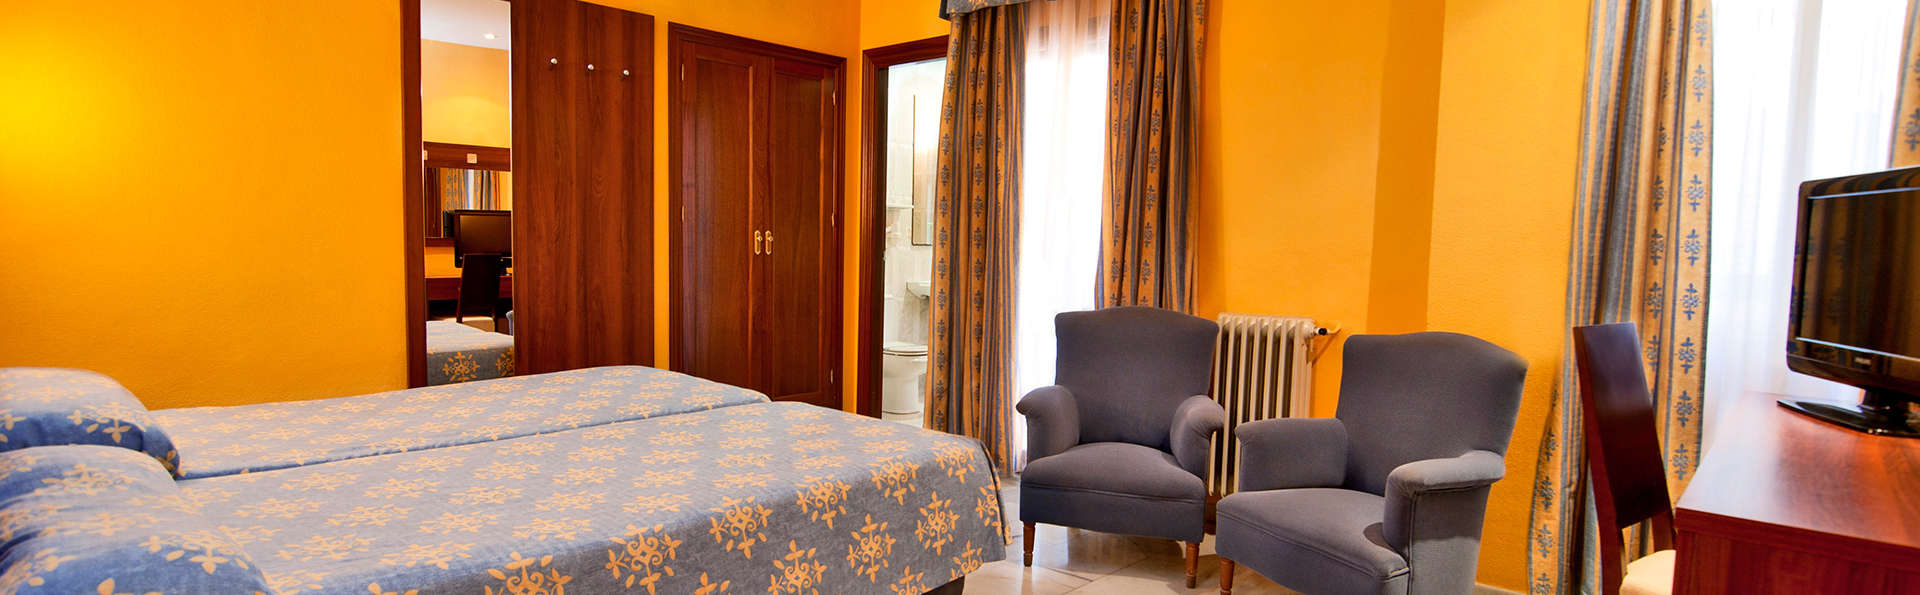 Hotel Nuevo Palas - EDIT_room4.jpg